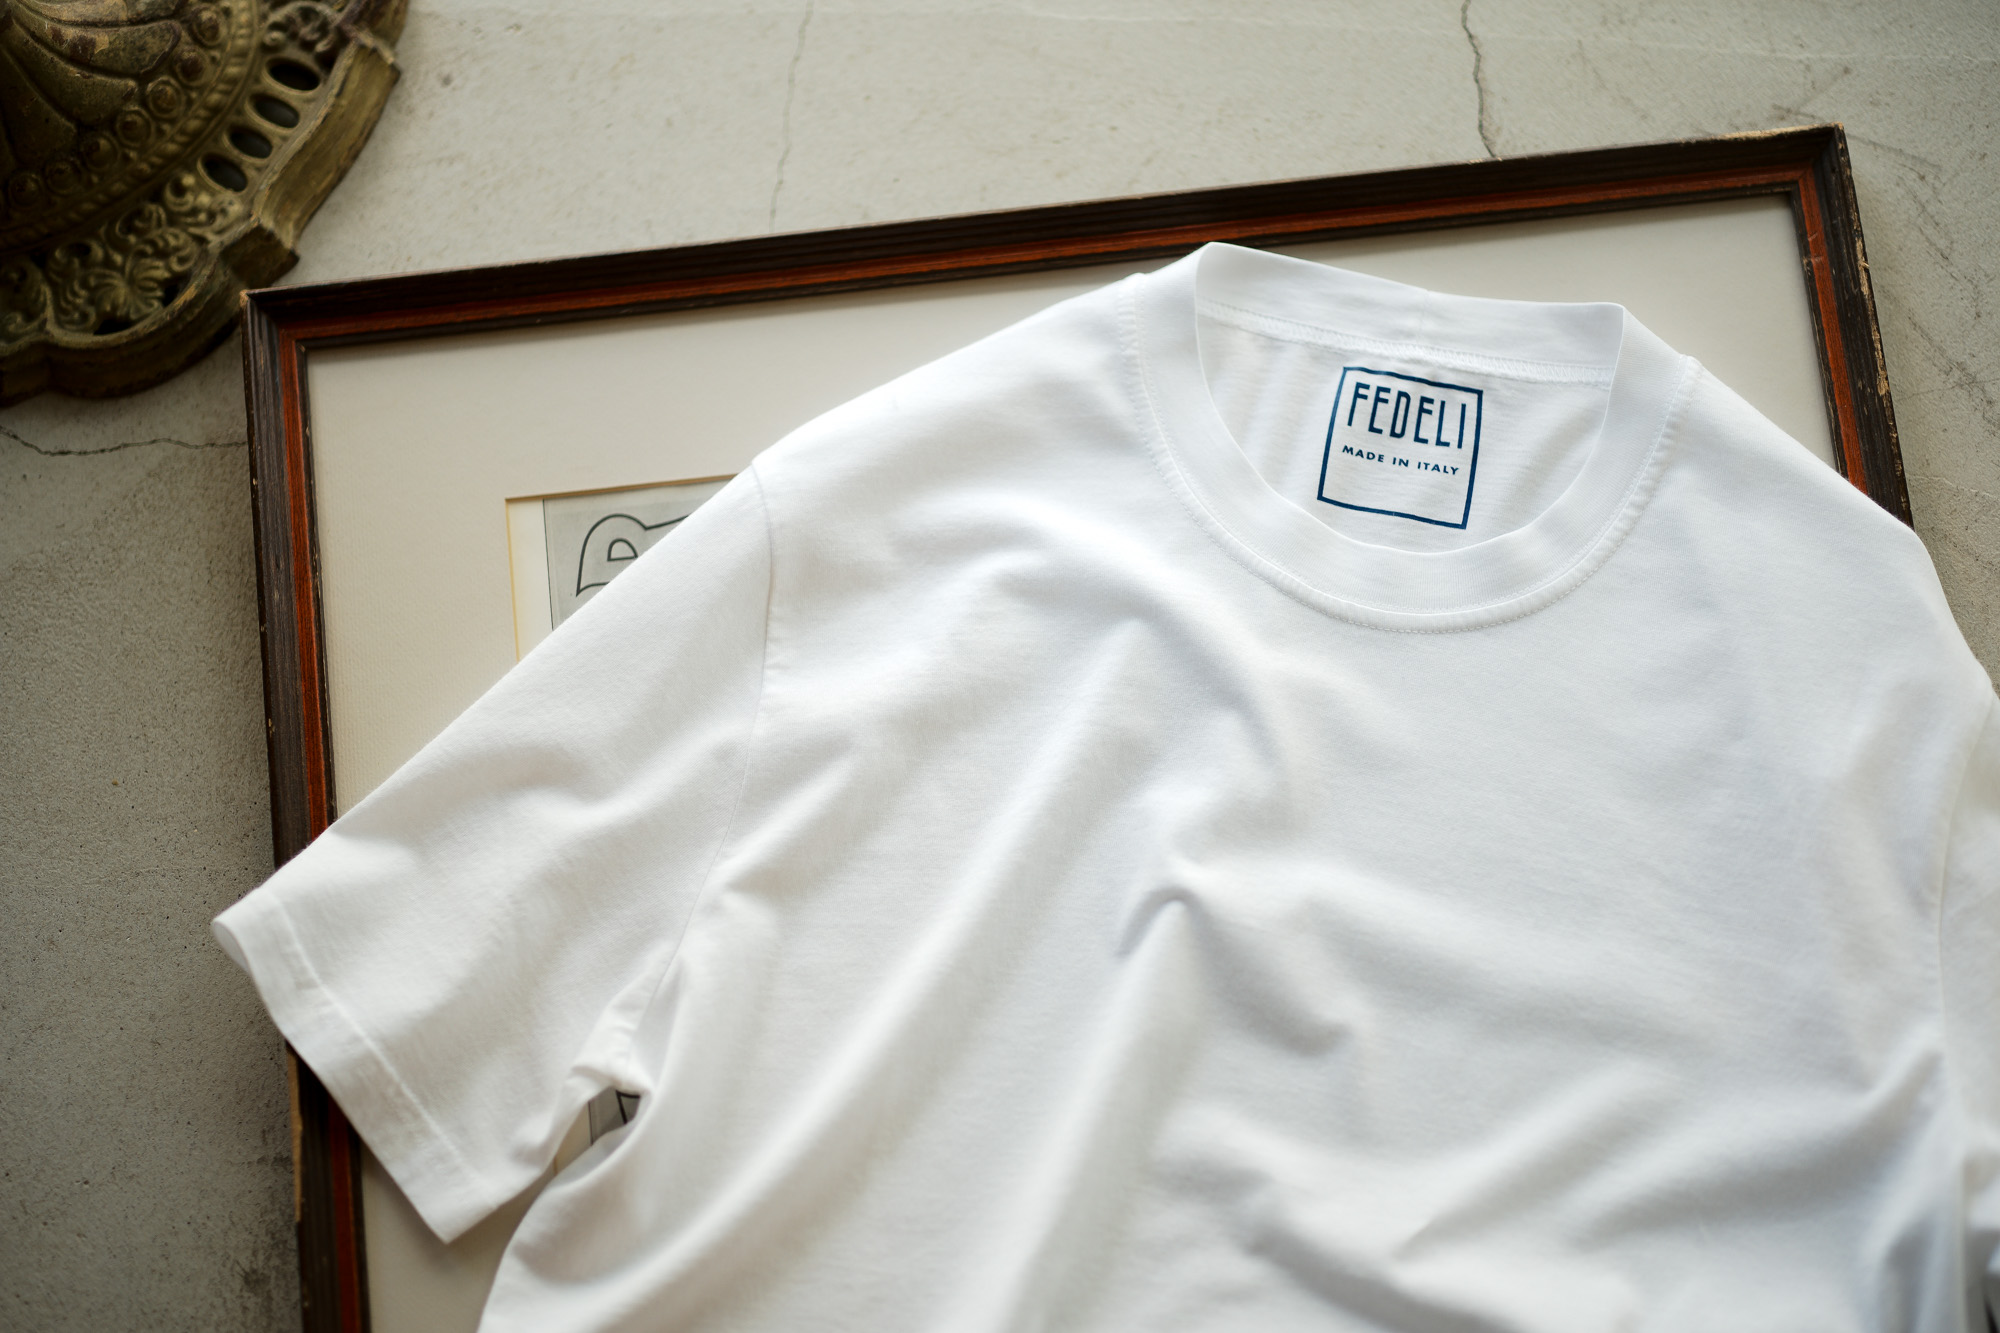 FEDELI(フェデリ) Crew Neck T-shirt (クルーネック Tシャツ) ギザコットン Tシャツ WHITE (ホワイト・41) made in italy (イタリア製) 2022 春夏 【Special Color】【ご予約開始】愛知 名古屋 Alto e Diritto altoediritto アルトエデリット 白Tシャツ